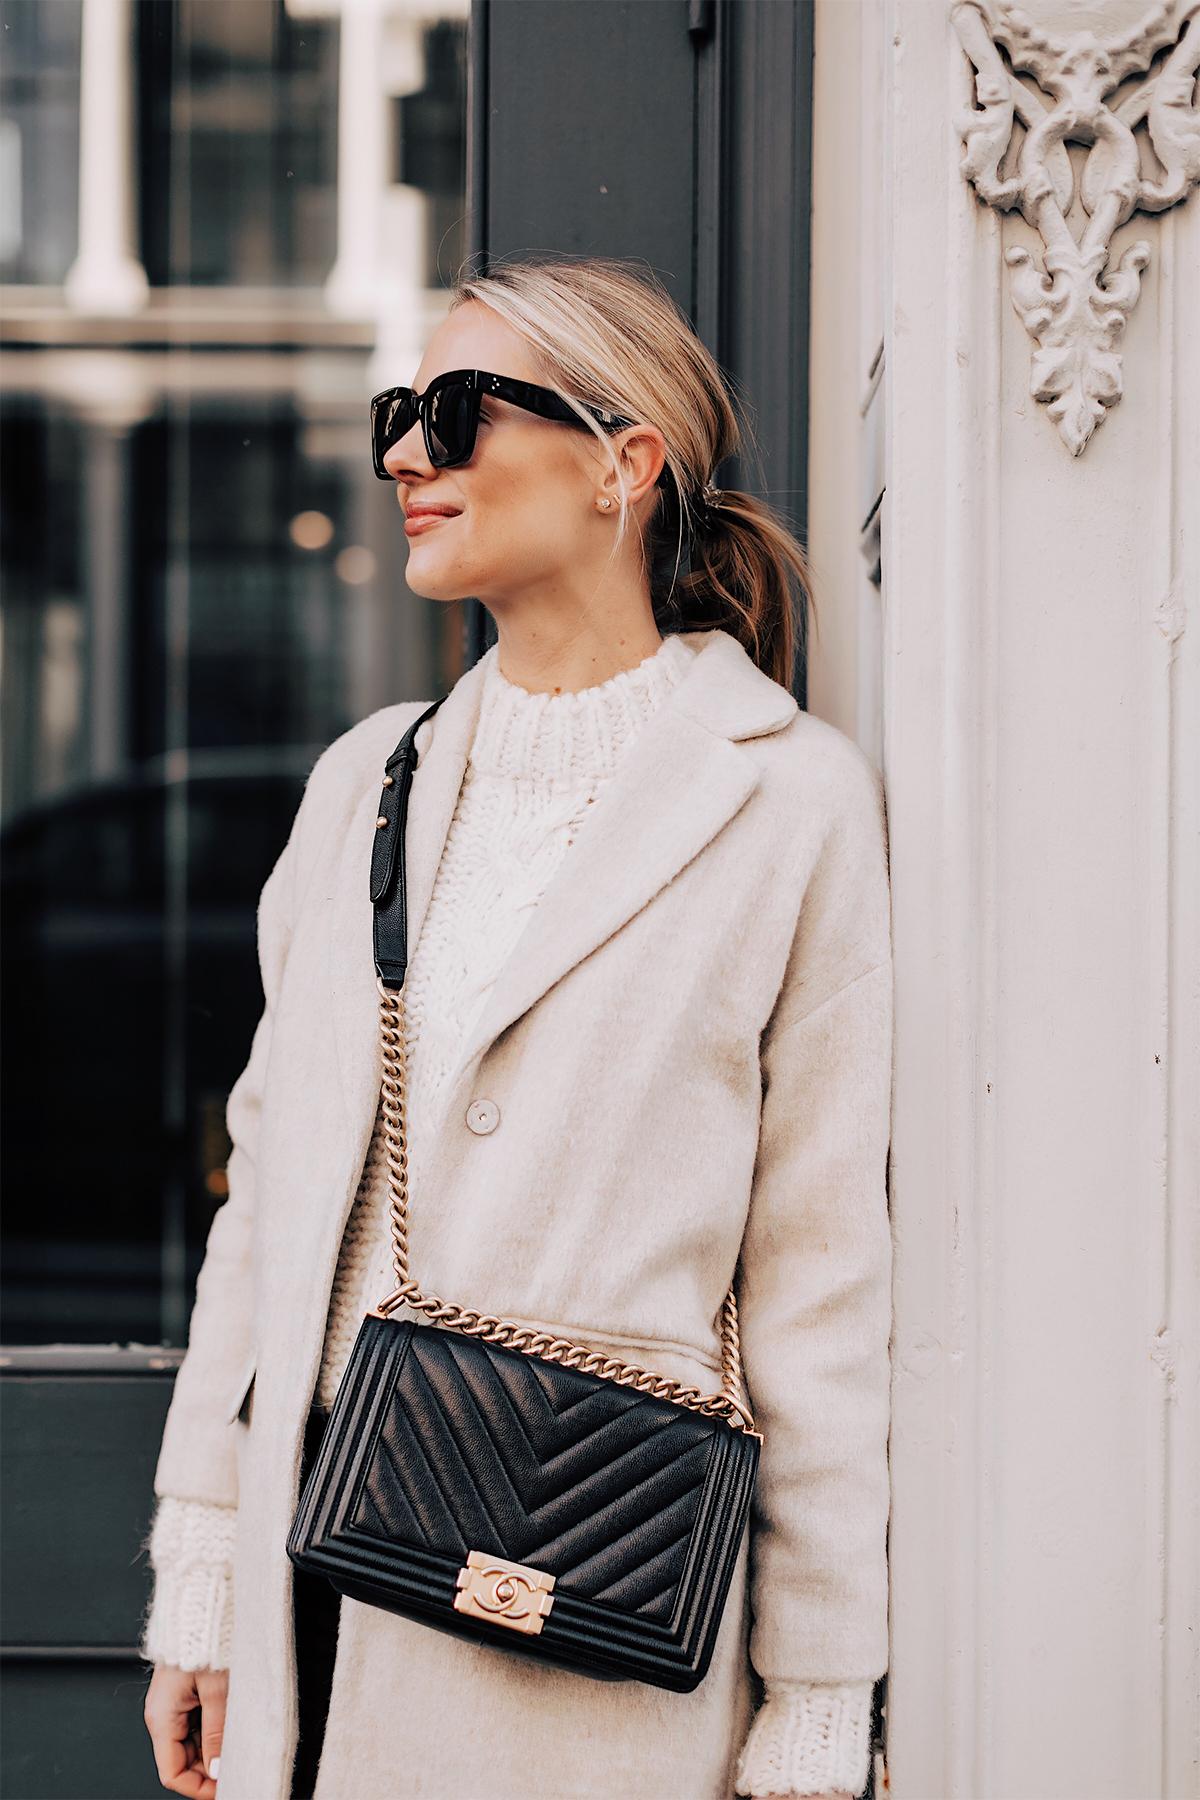 Blonde Woman Wearing White Knit Sweater Beige Wool Coat Chanel Black Boy Bag Fashion Jackson Fashion Blogger NYFW Street Style